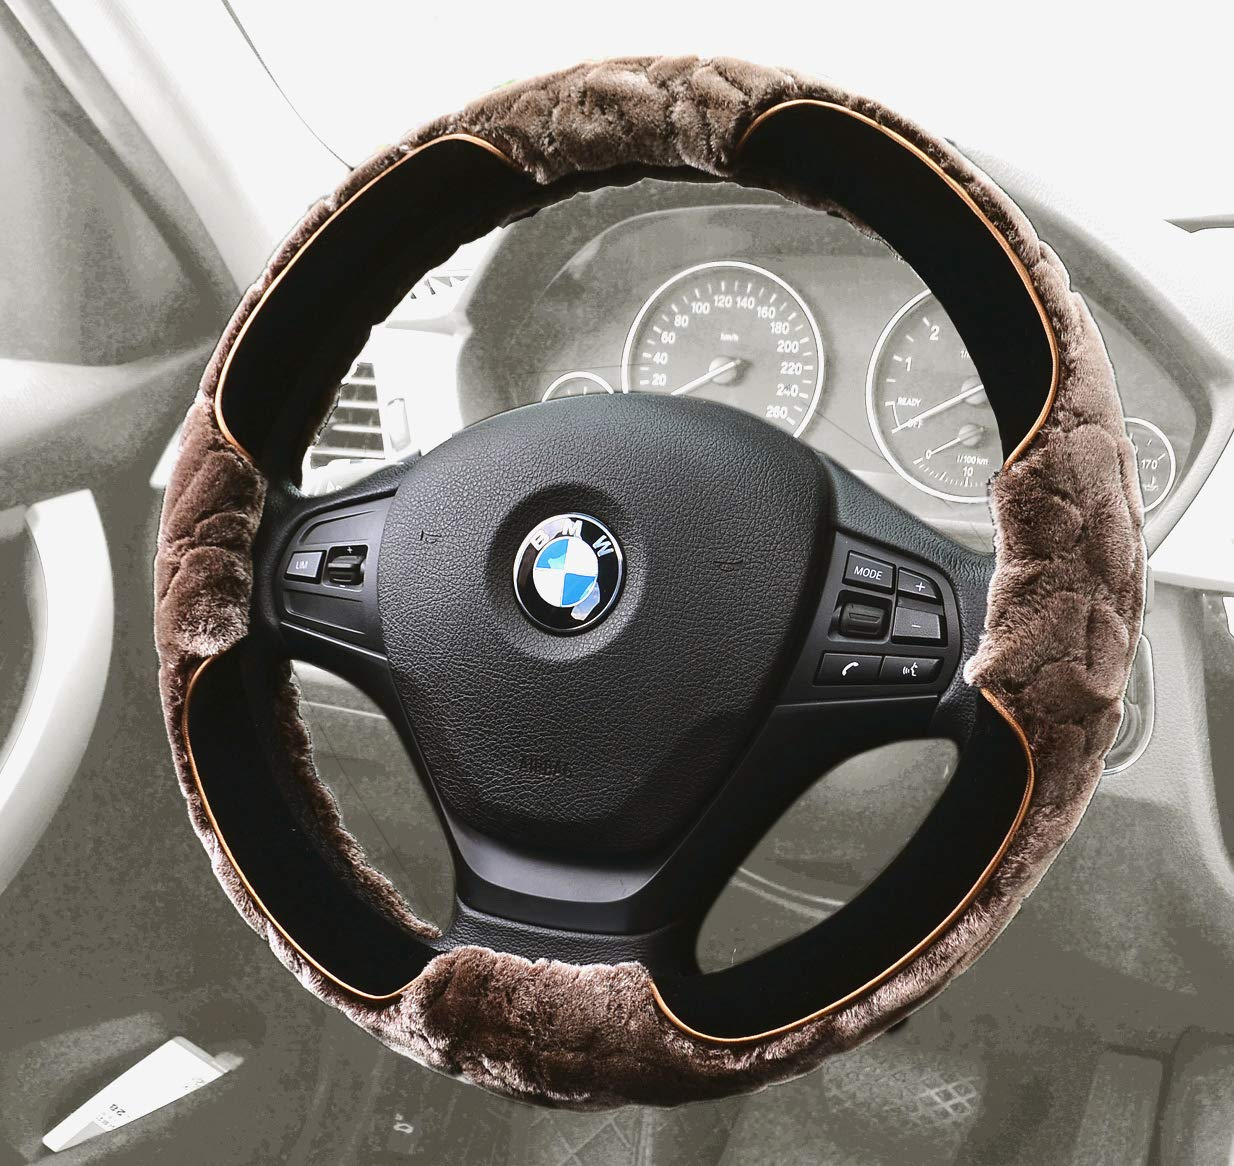 Furry Steering Wheel Cover15 InchFaux Wool Soft FurWarm Winter Universalfor Auto Car SUV (Short Plush, Brown)